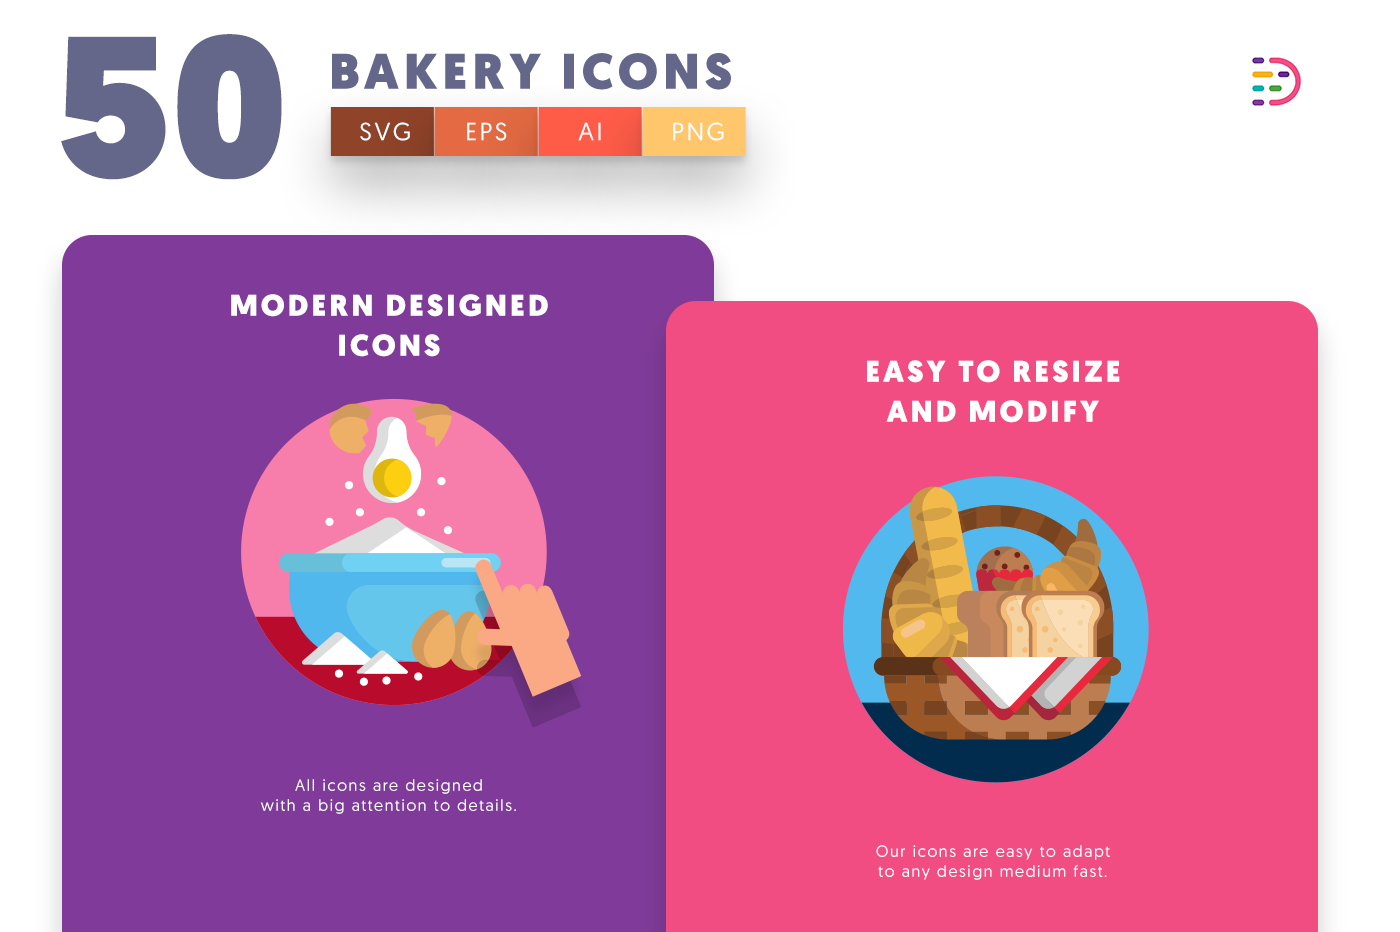 Design ready 50 Bakery Icons